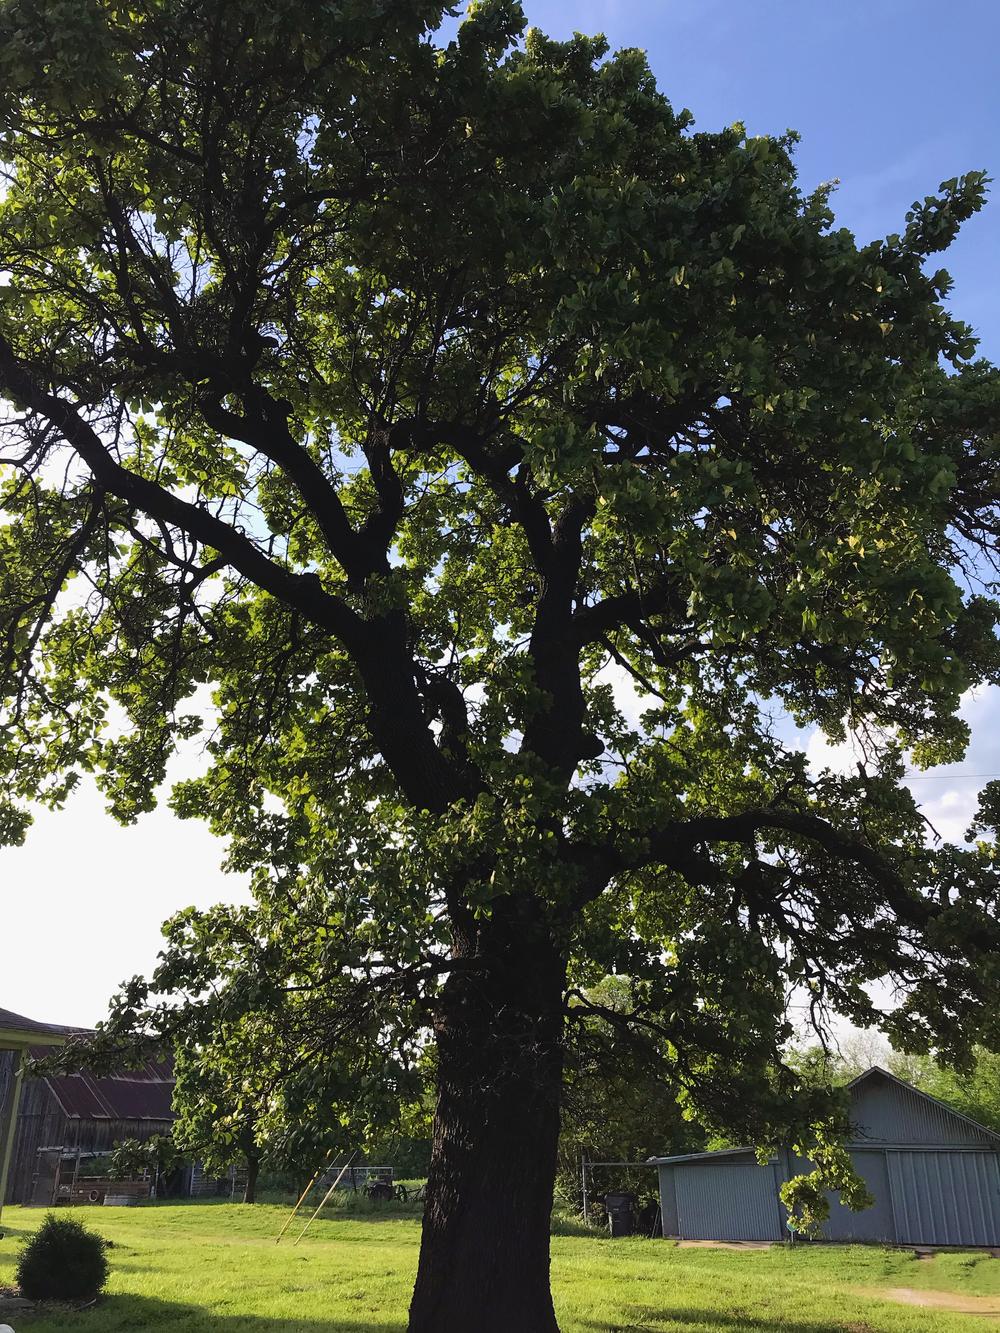 The beautiful, towering Blackjack Oak at the end of the long dirt drive | Broken Arrow, Oklahoma